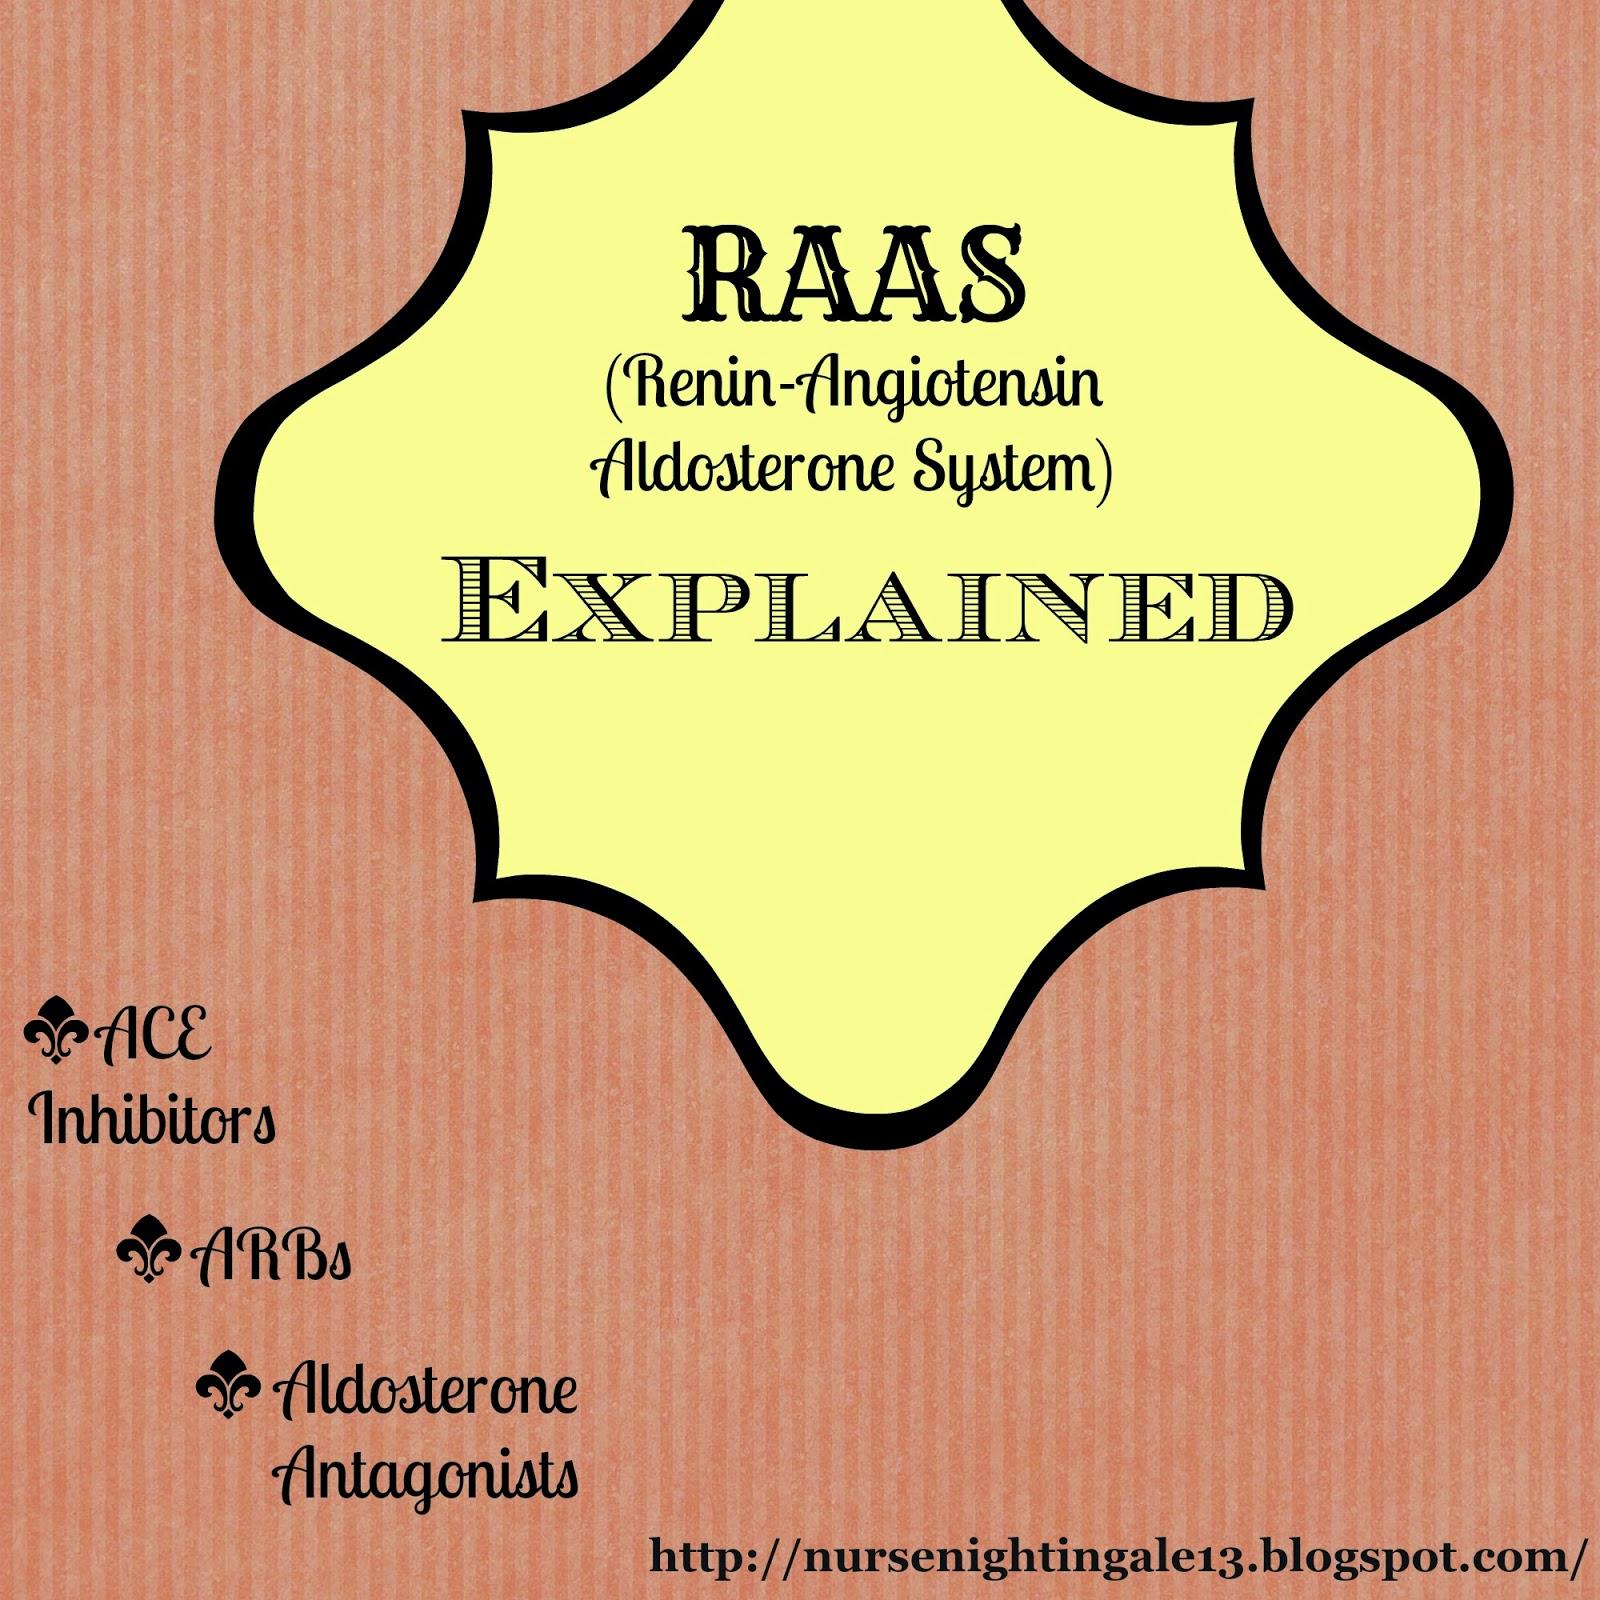 Renin, Angiotensin, Aldosterone, RAAS, nurse, ACE Inhibitors, ARBs